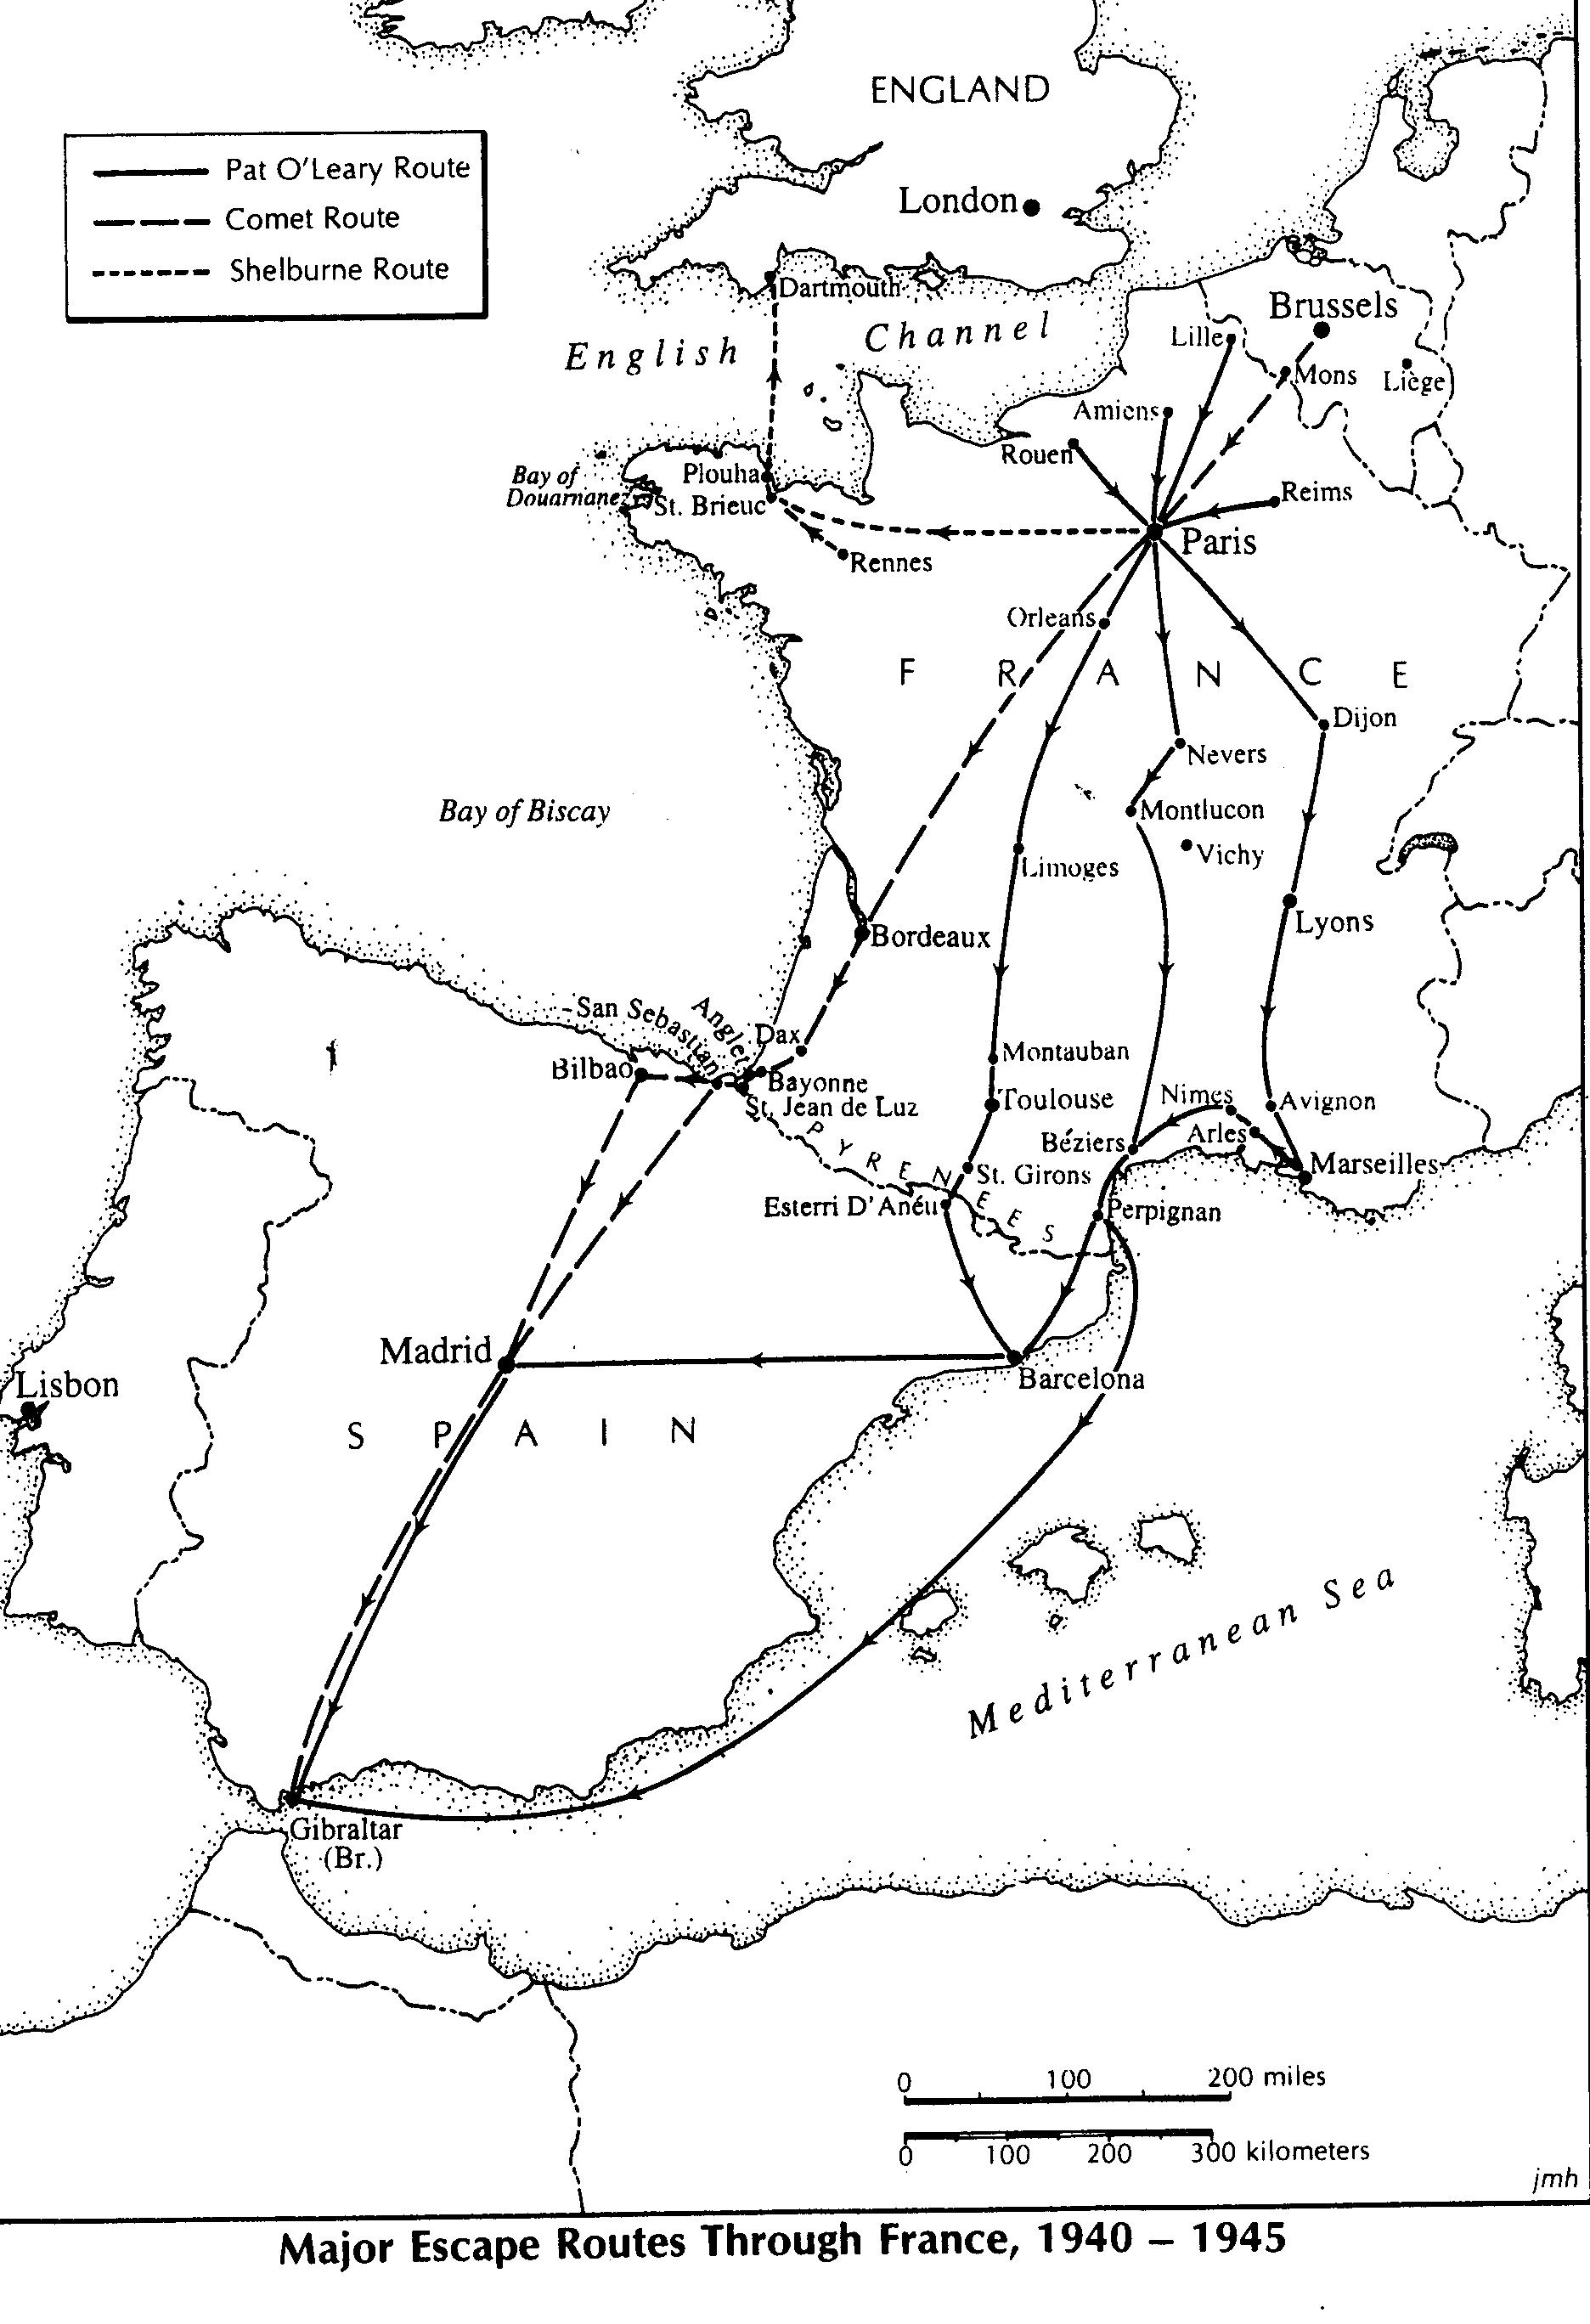 Maps Of Major Escape Routes Through France